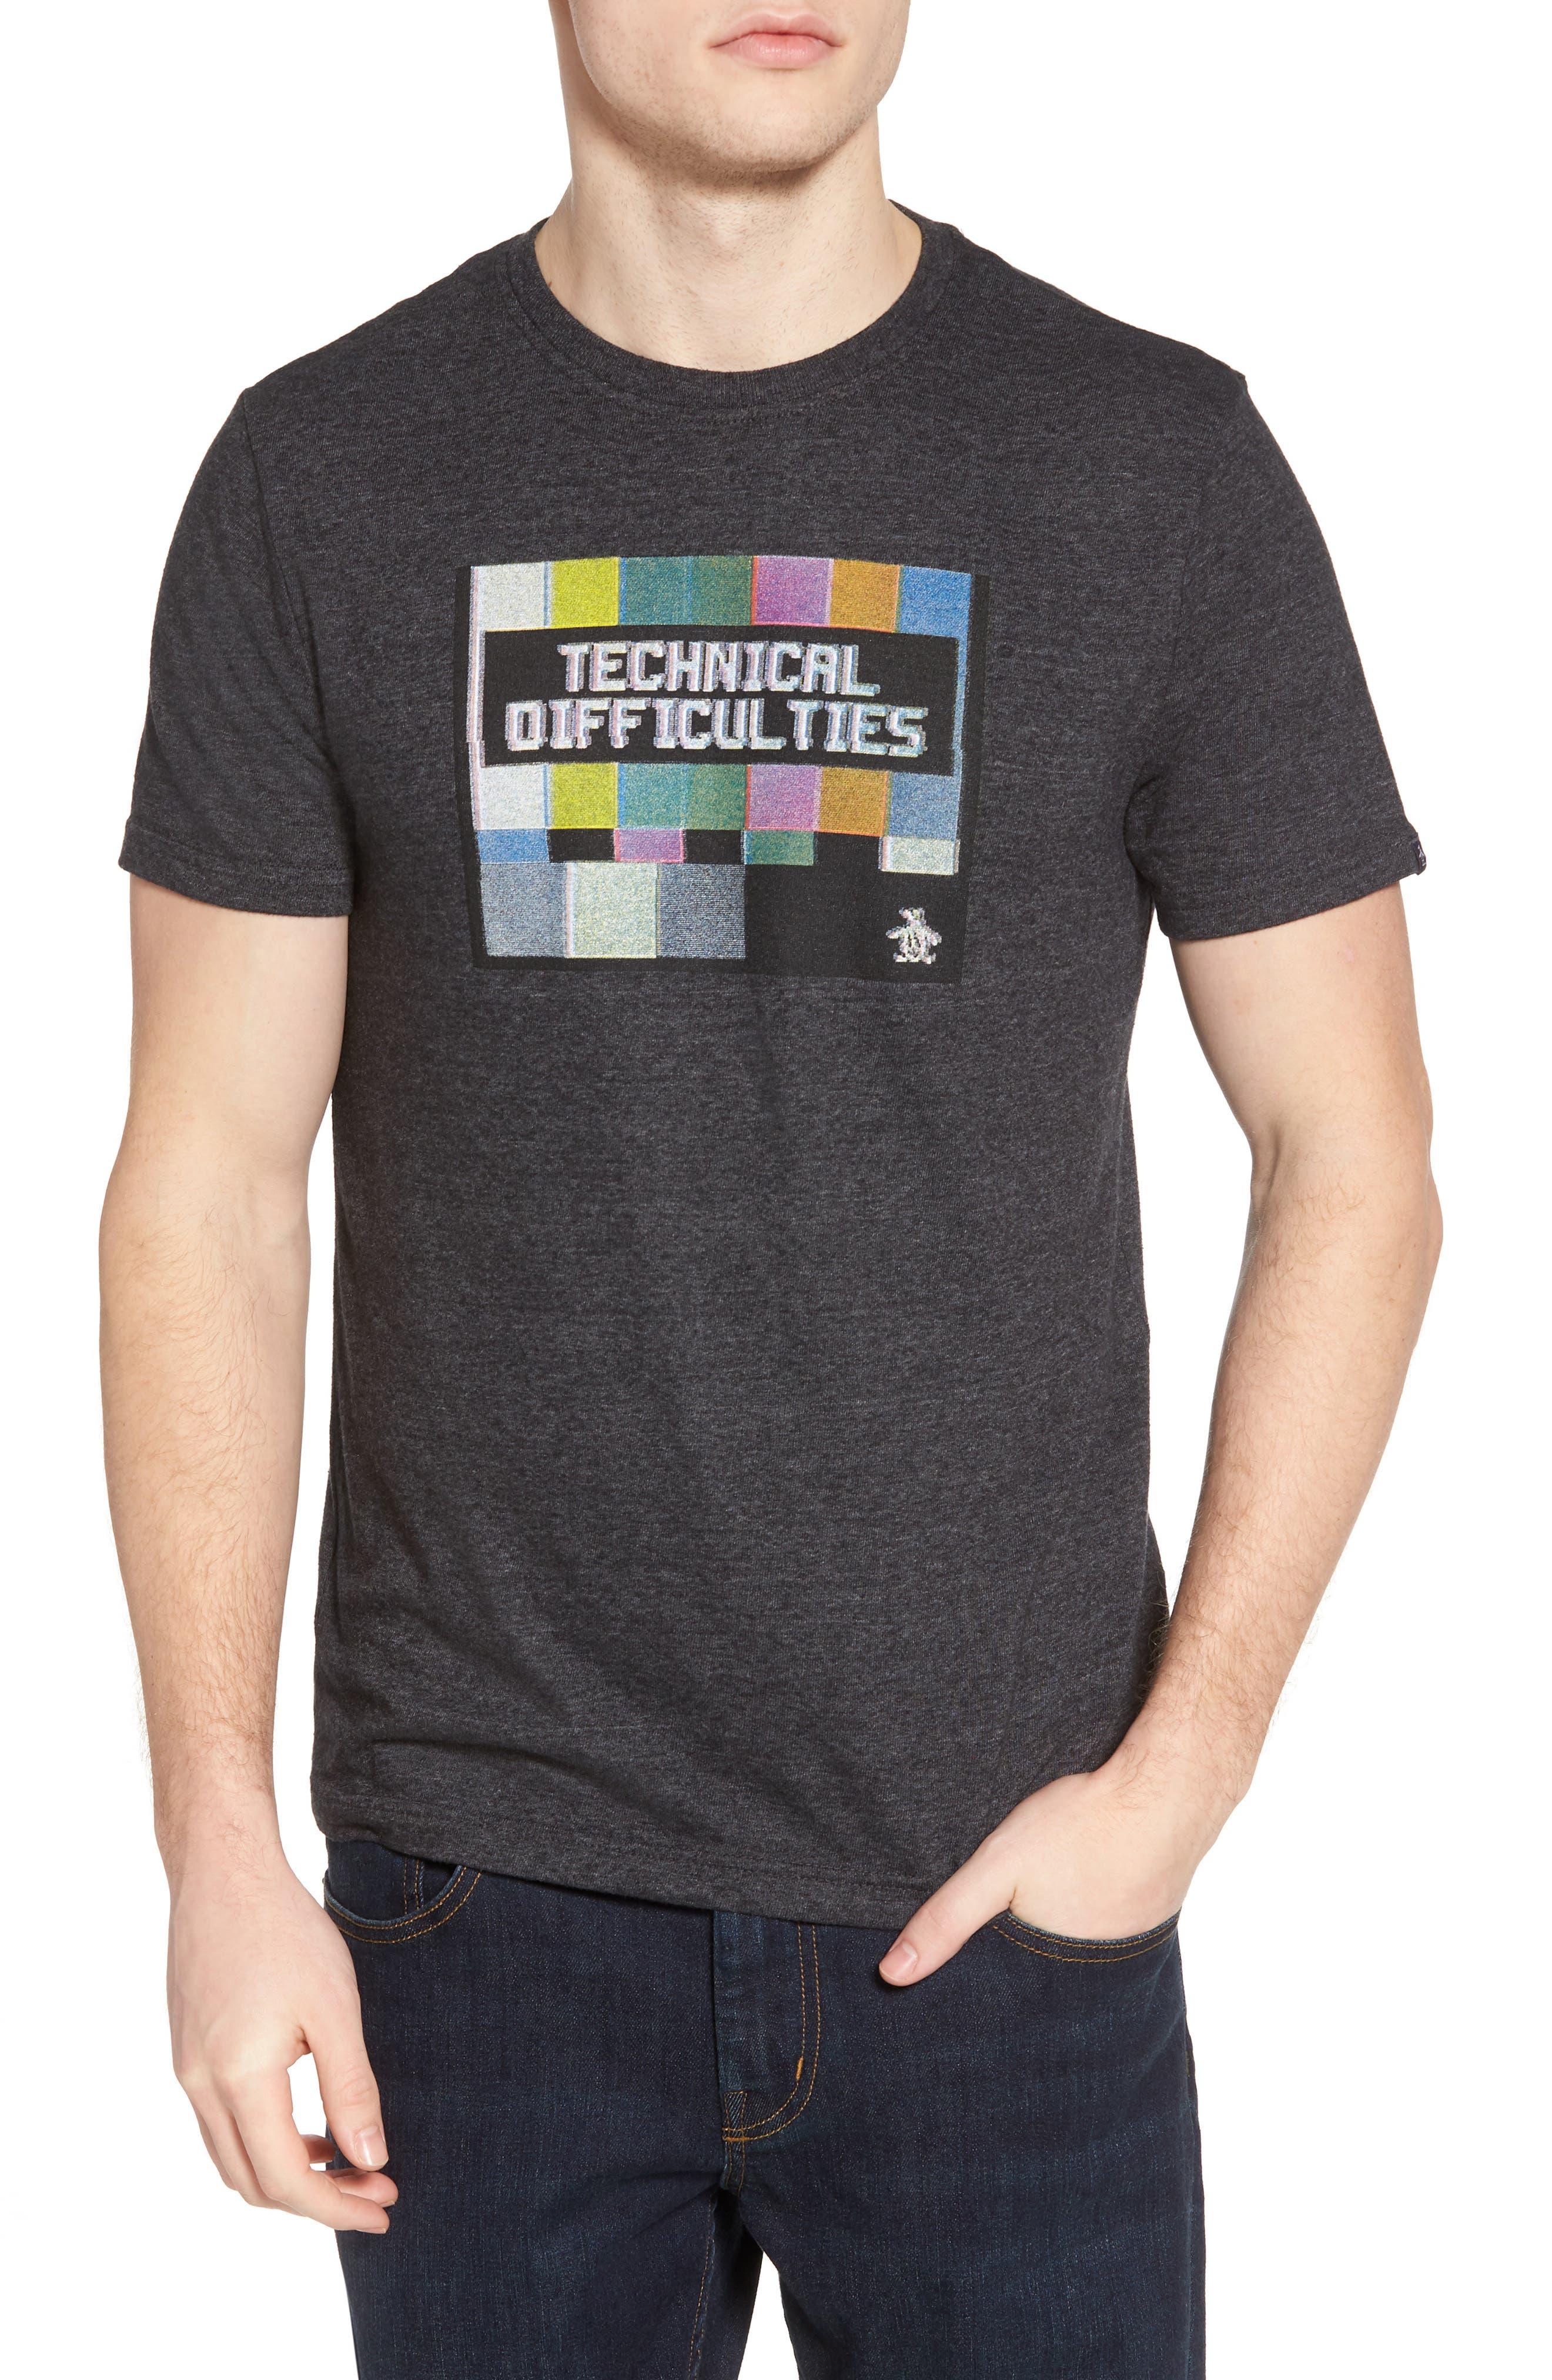 Original Penguin Technical Difficulties T-Shirt